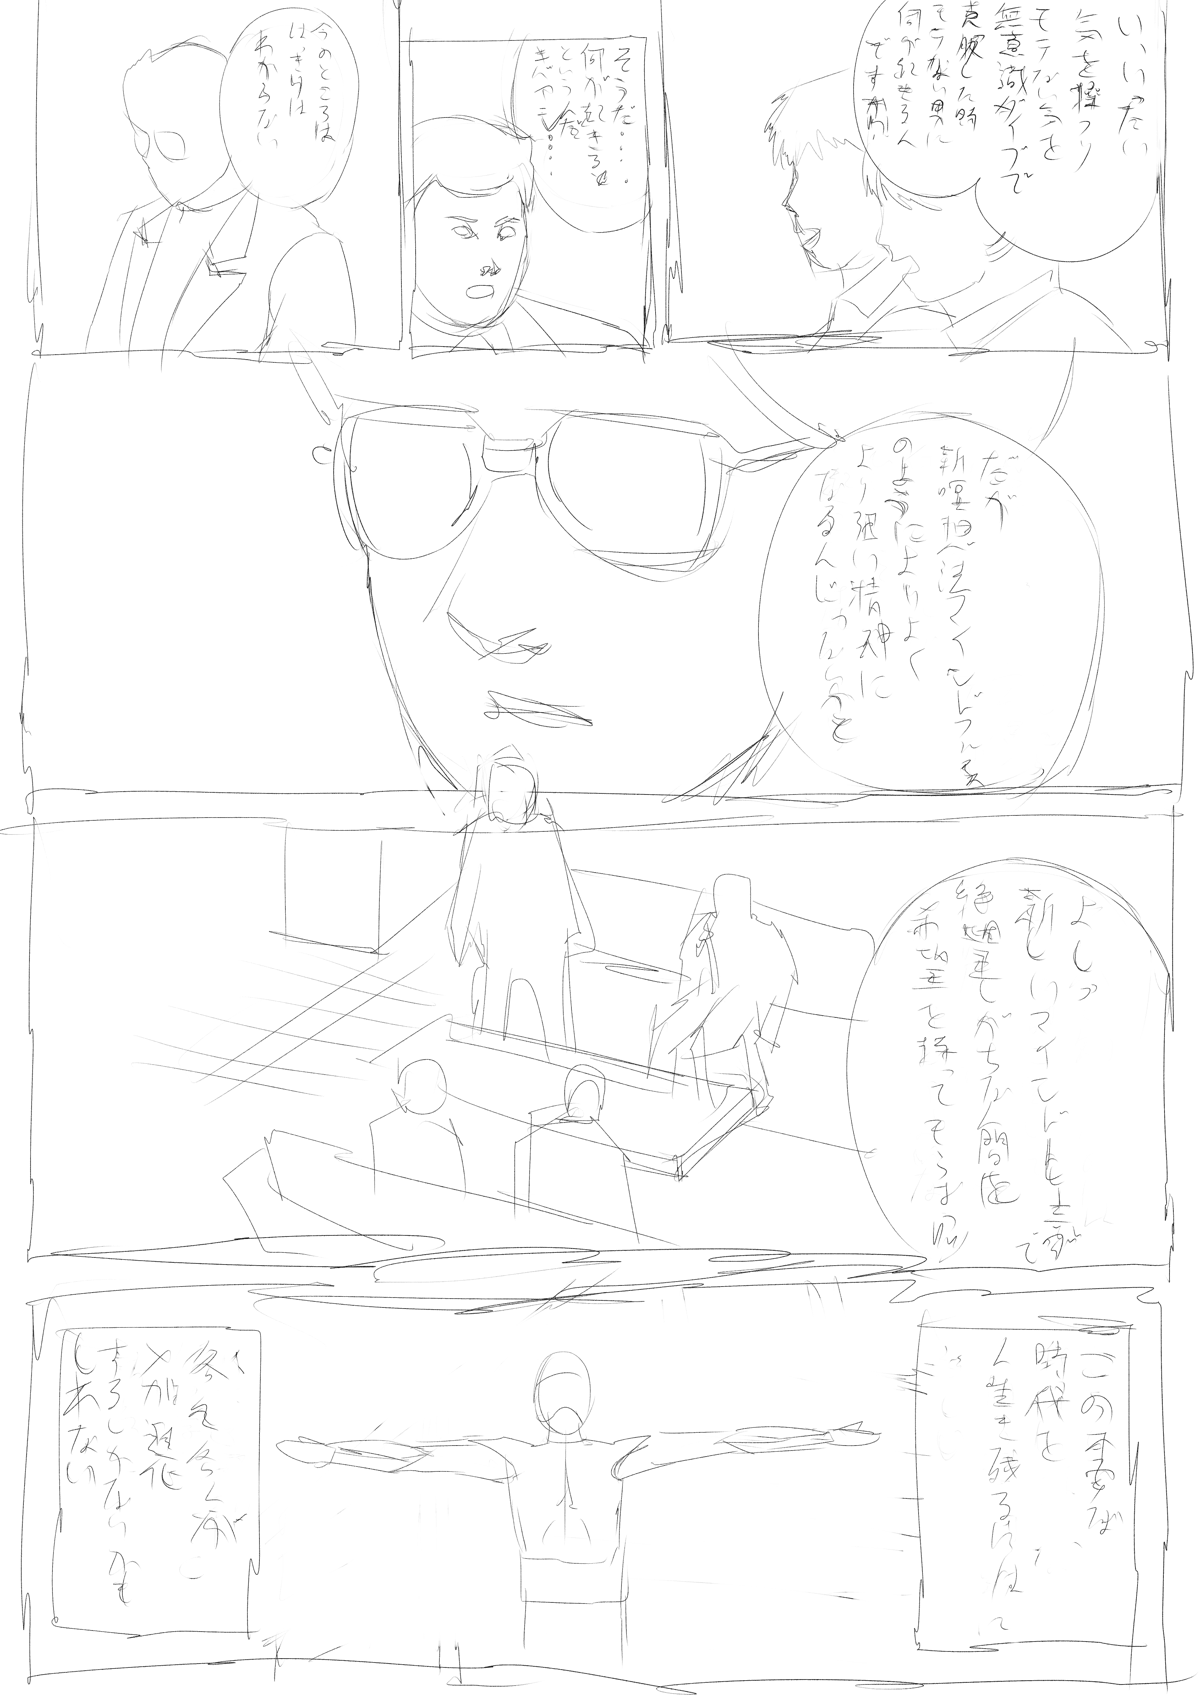 MMR漫画 「古代の気功術の全貌とは!?謎のモテ術を追え」ラフ